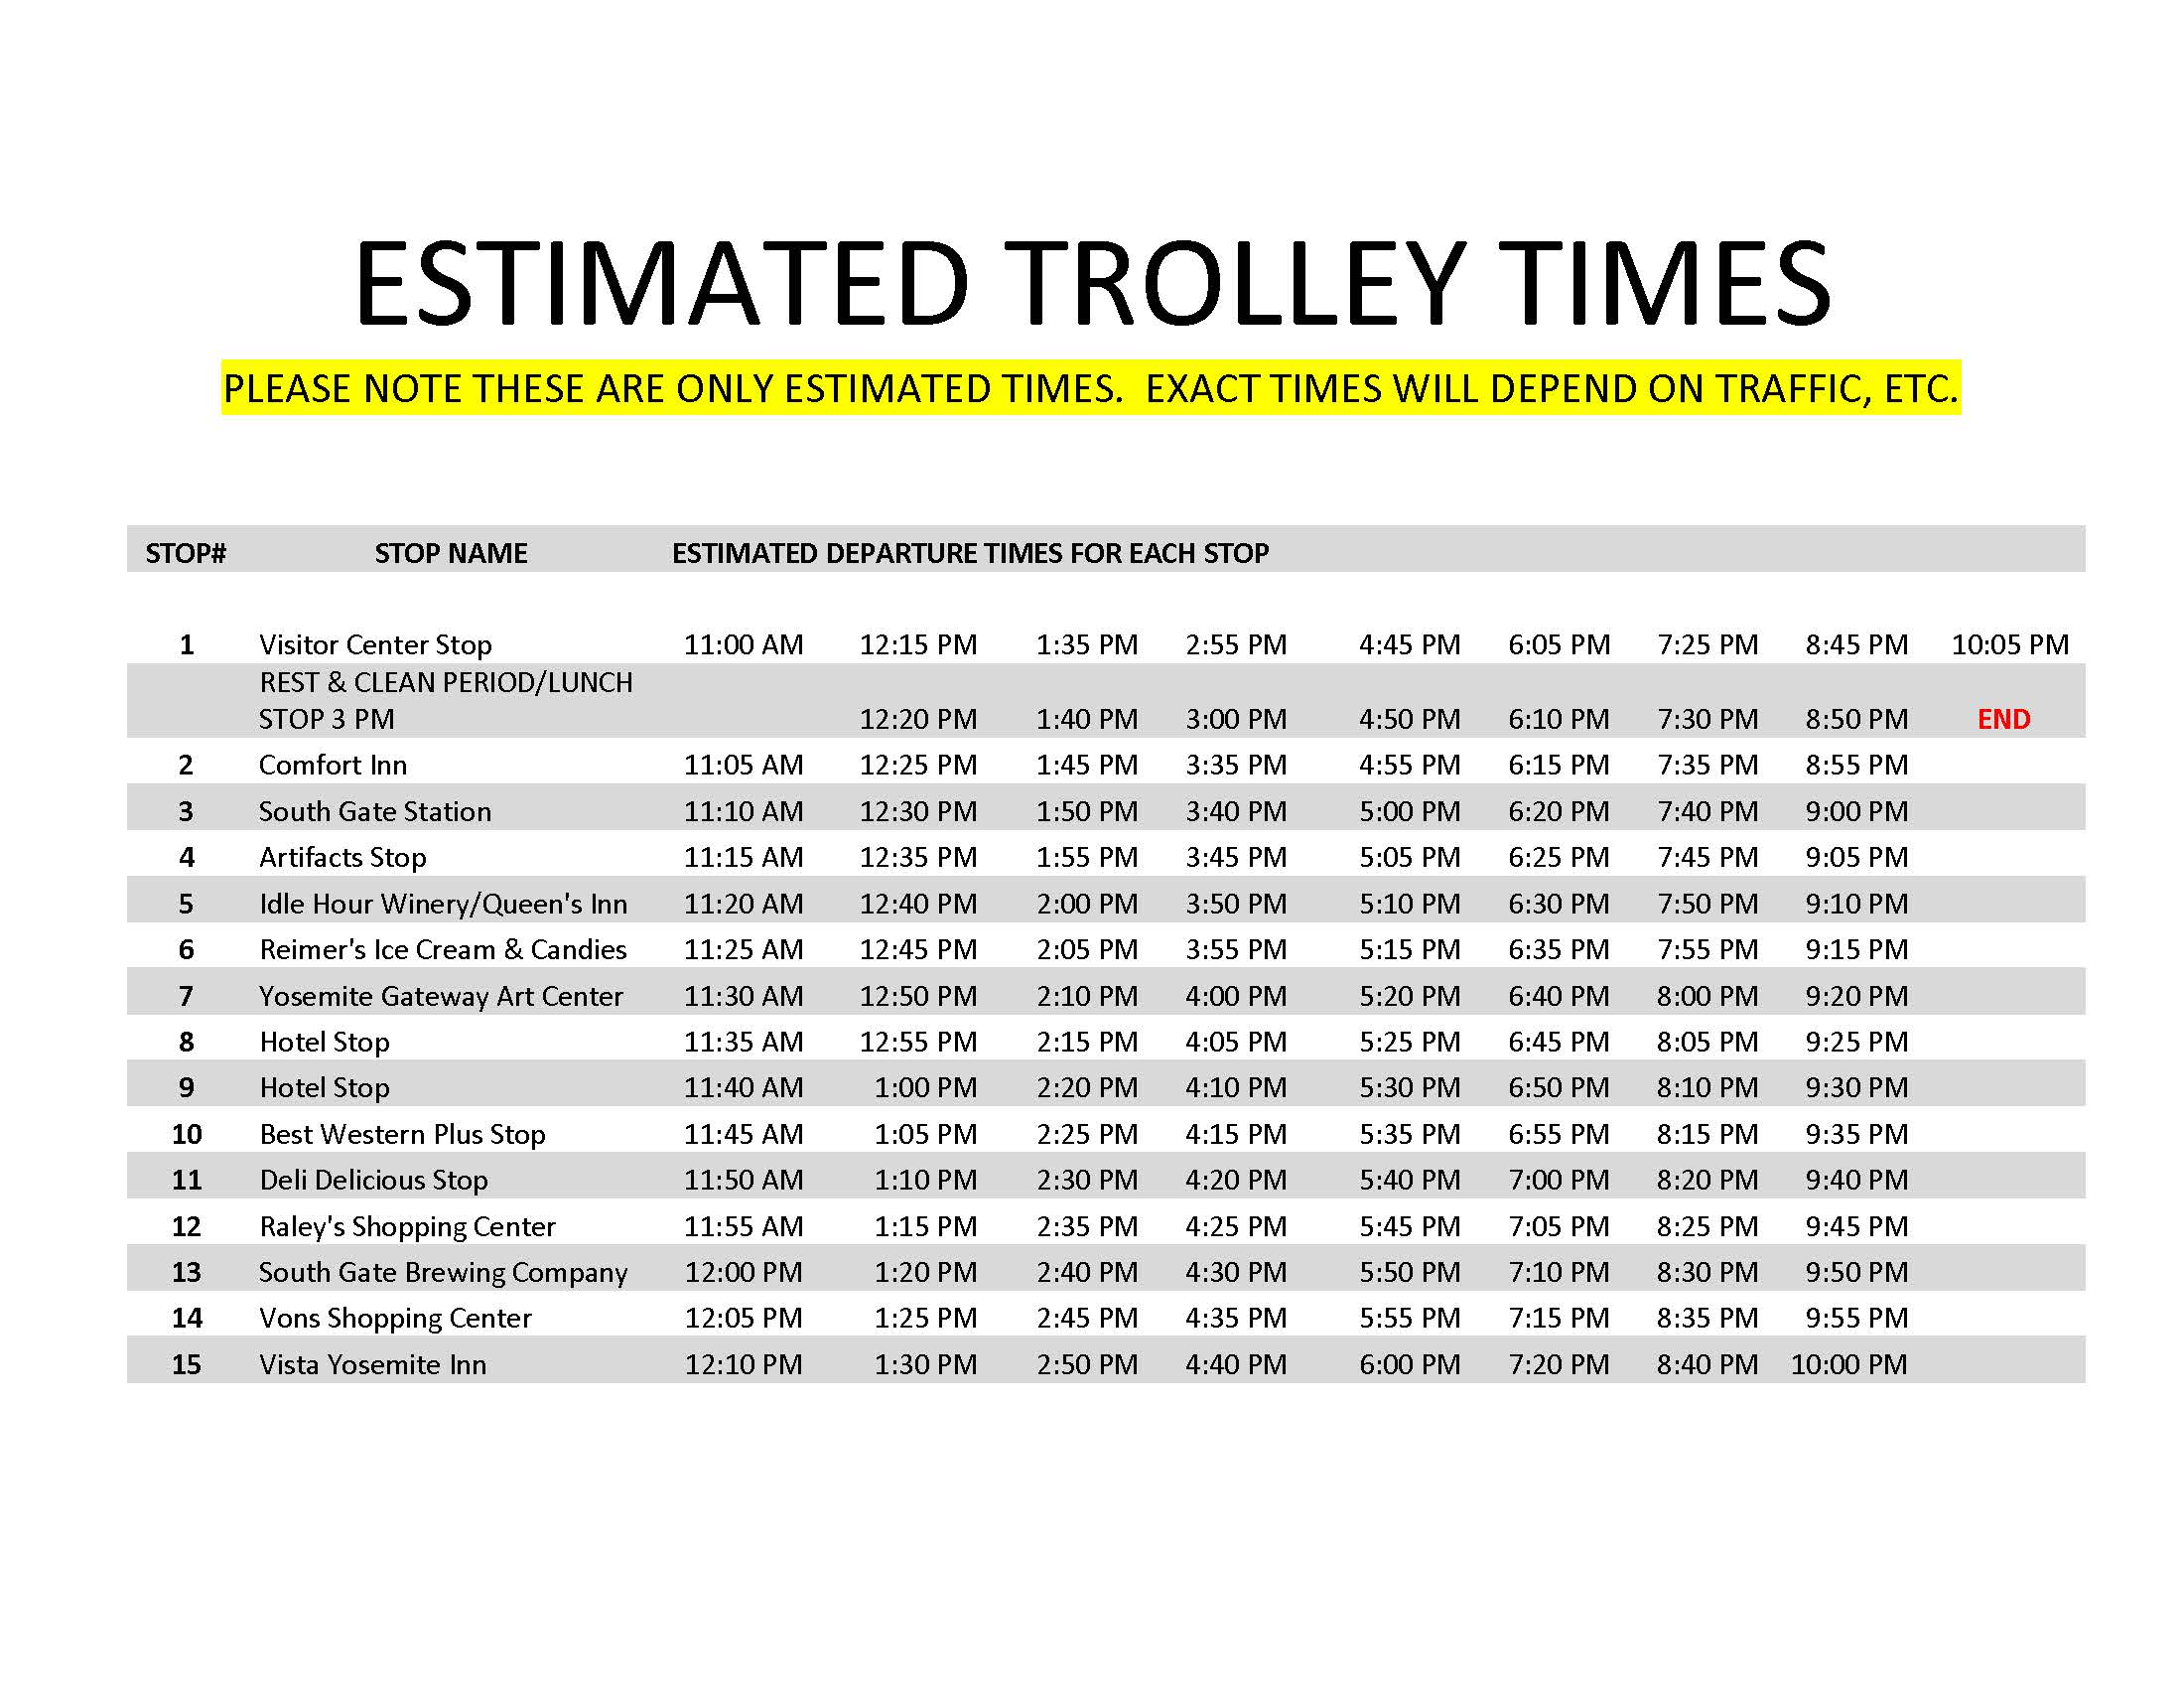 Estimated Trolley Times